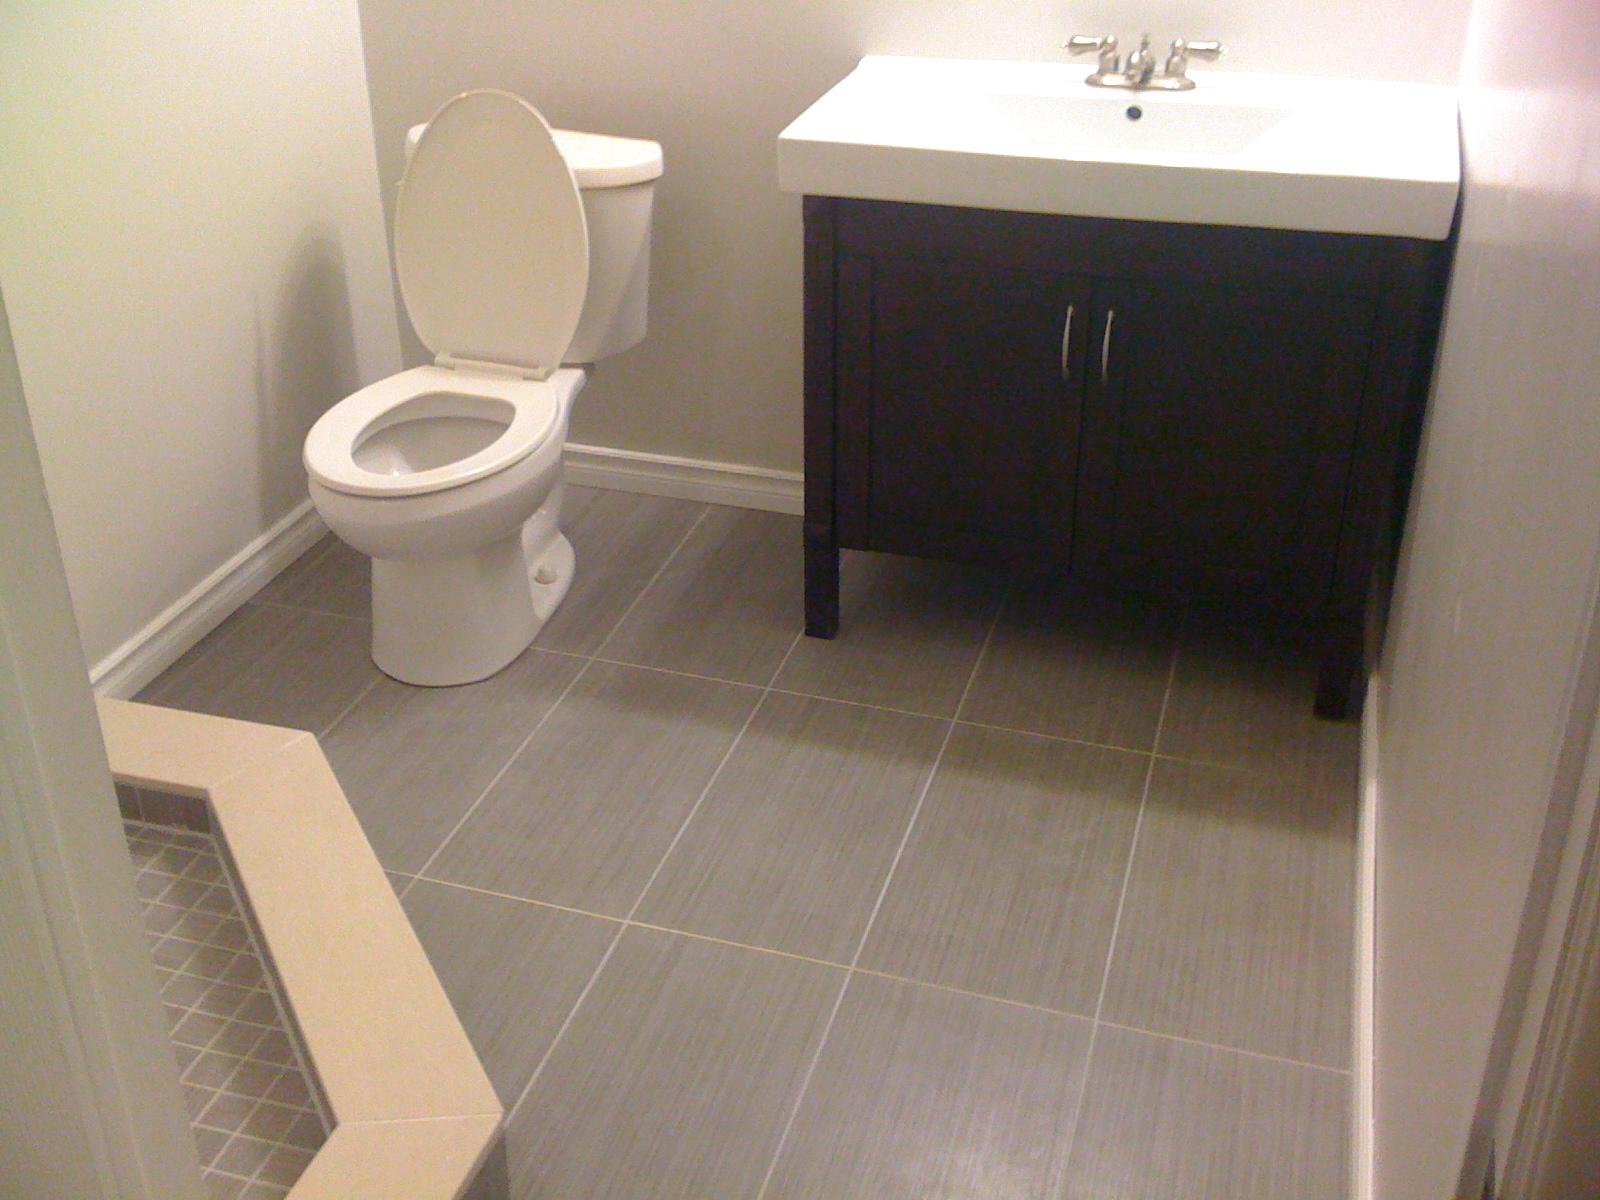 Bathroom floor in porcelain